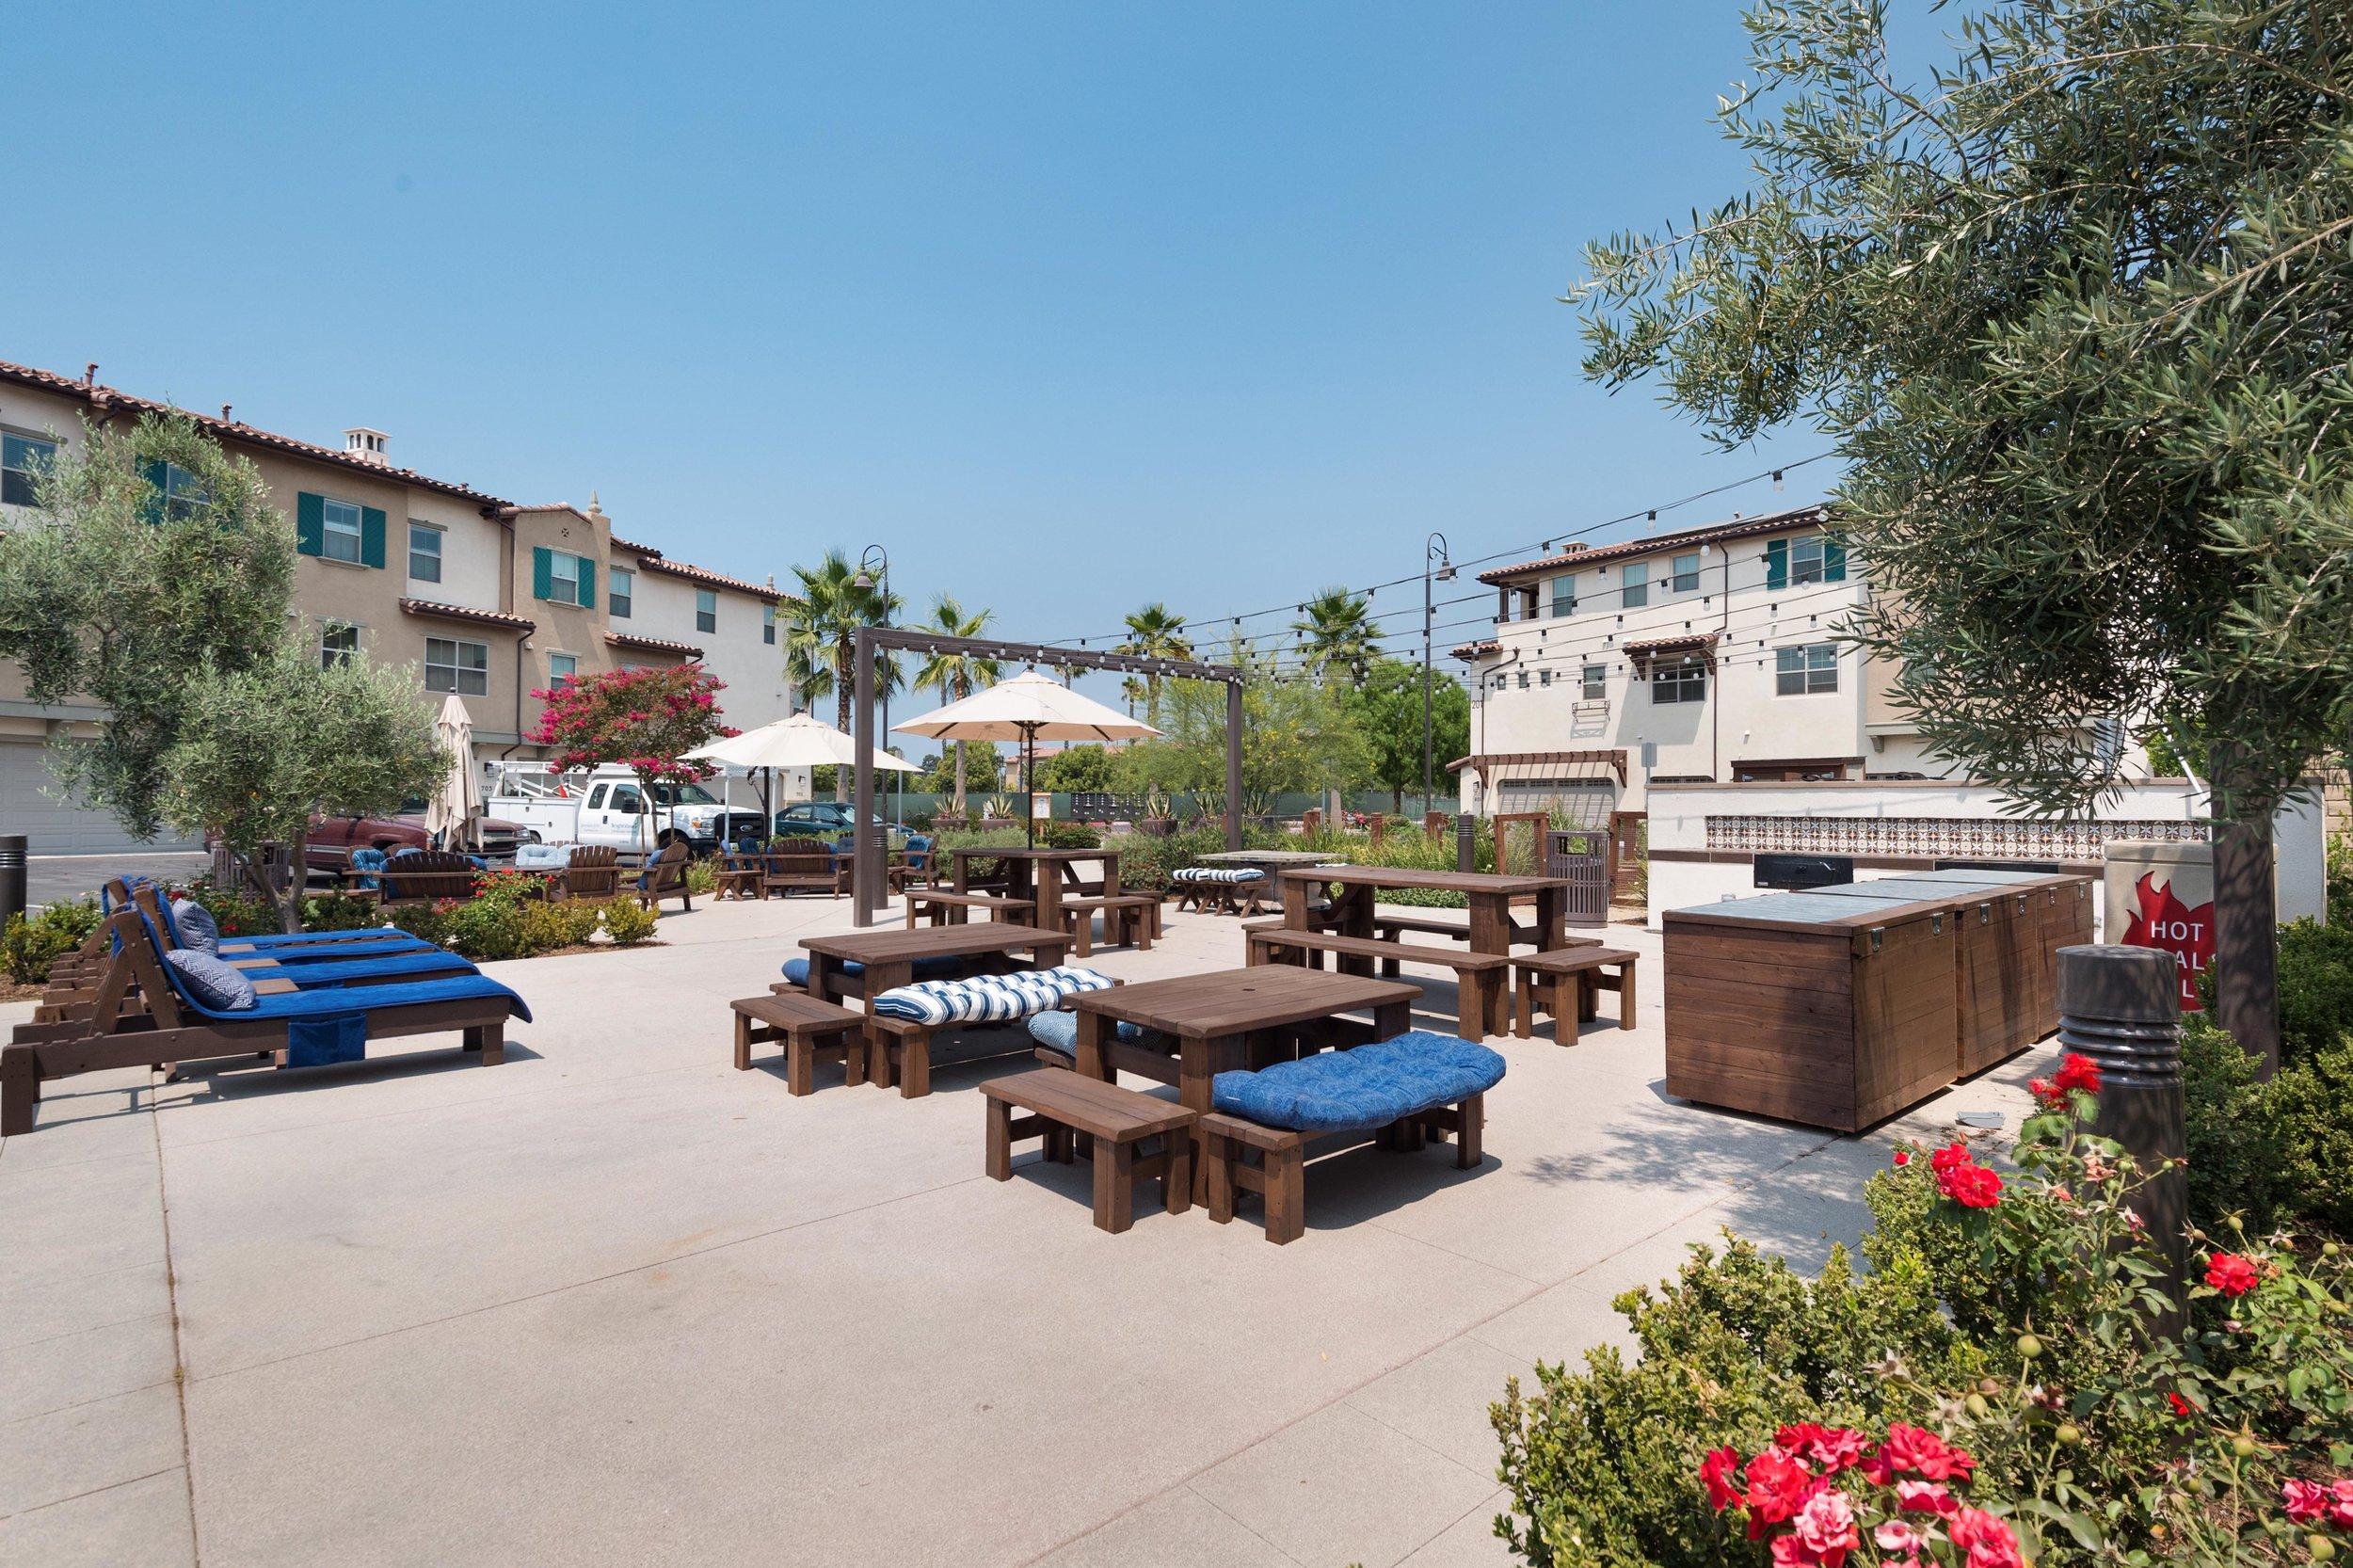 004 Courtyard 207 Westpark Court Unit 702 Camarillo Bally Khehra For Sale Lease The Malibu Life Team Luxury Real Estate.jpg